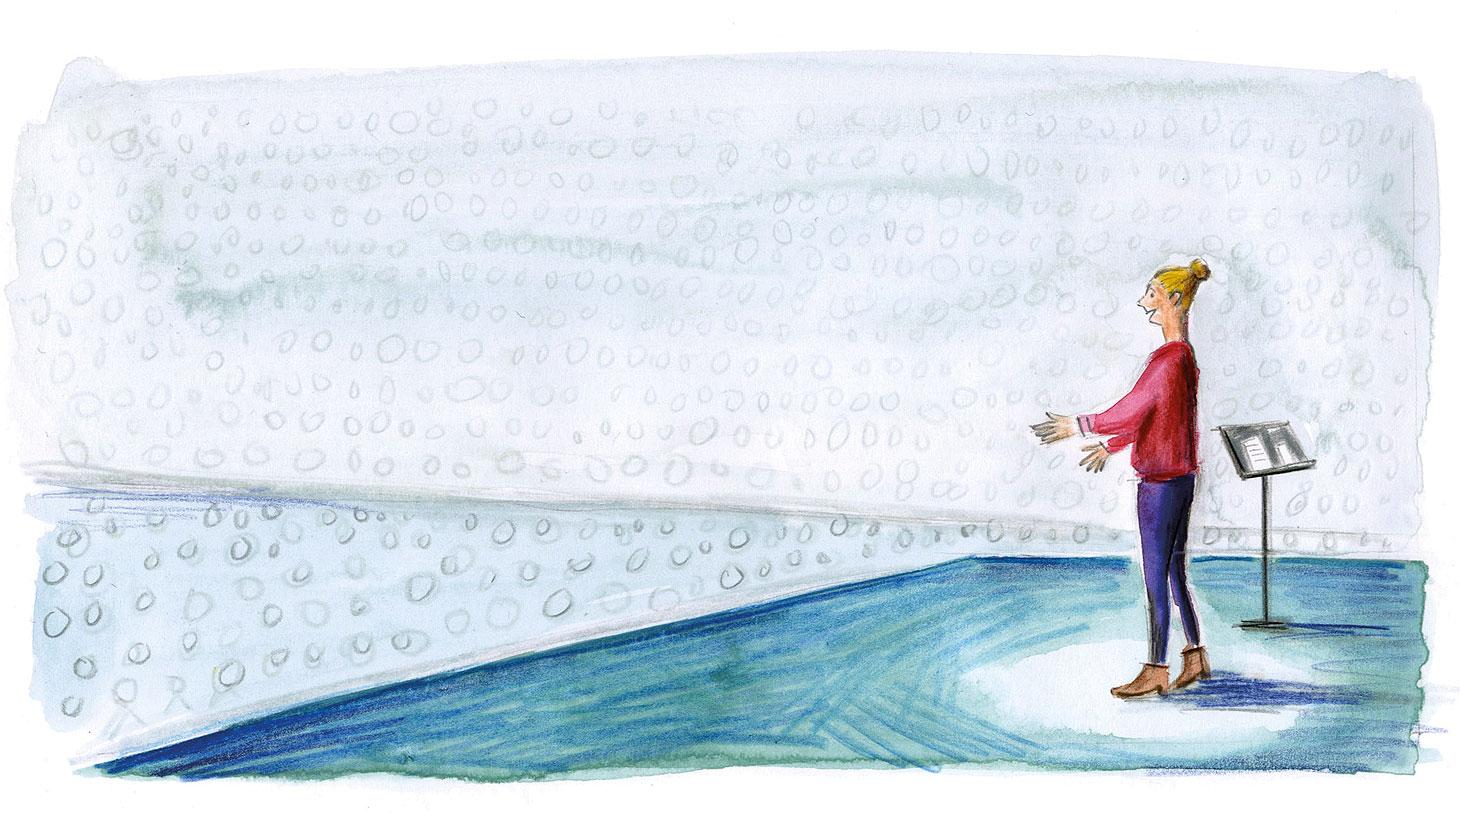 Illustration of evangelist by Elisa Cunningham